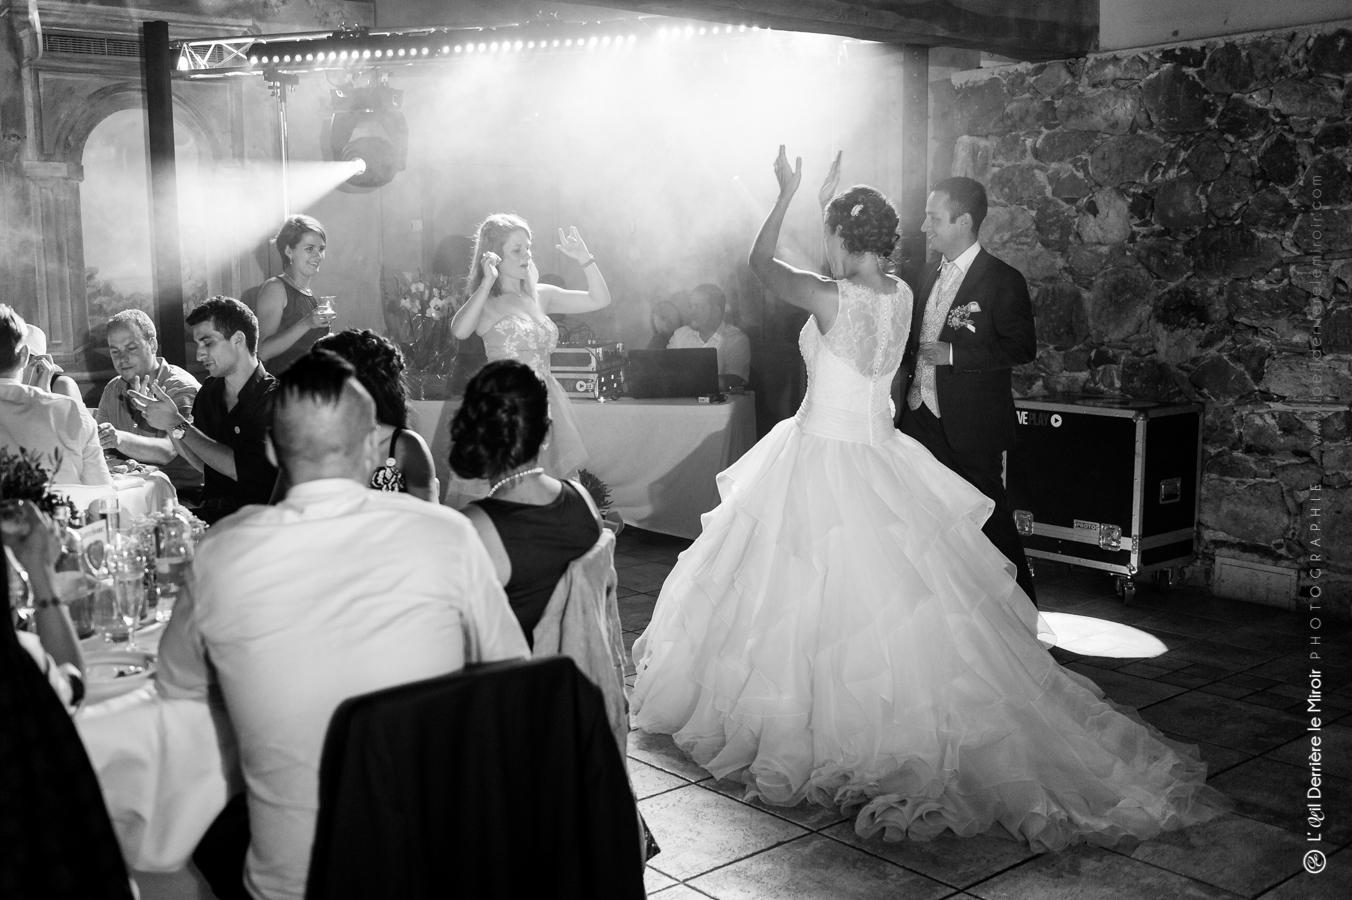 mariage-cj-vaugrenier-loeilderrierelemiroir-094